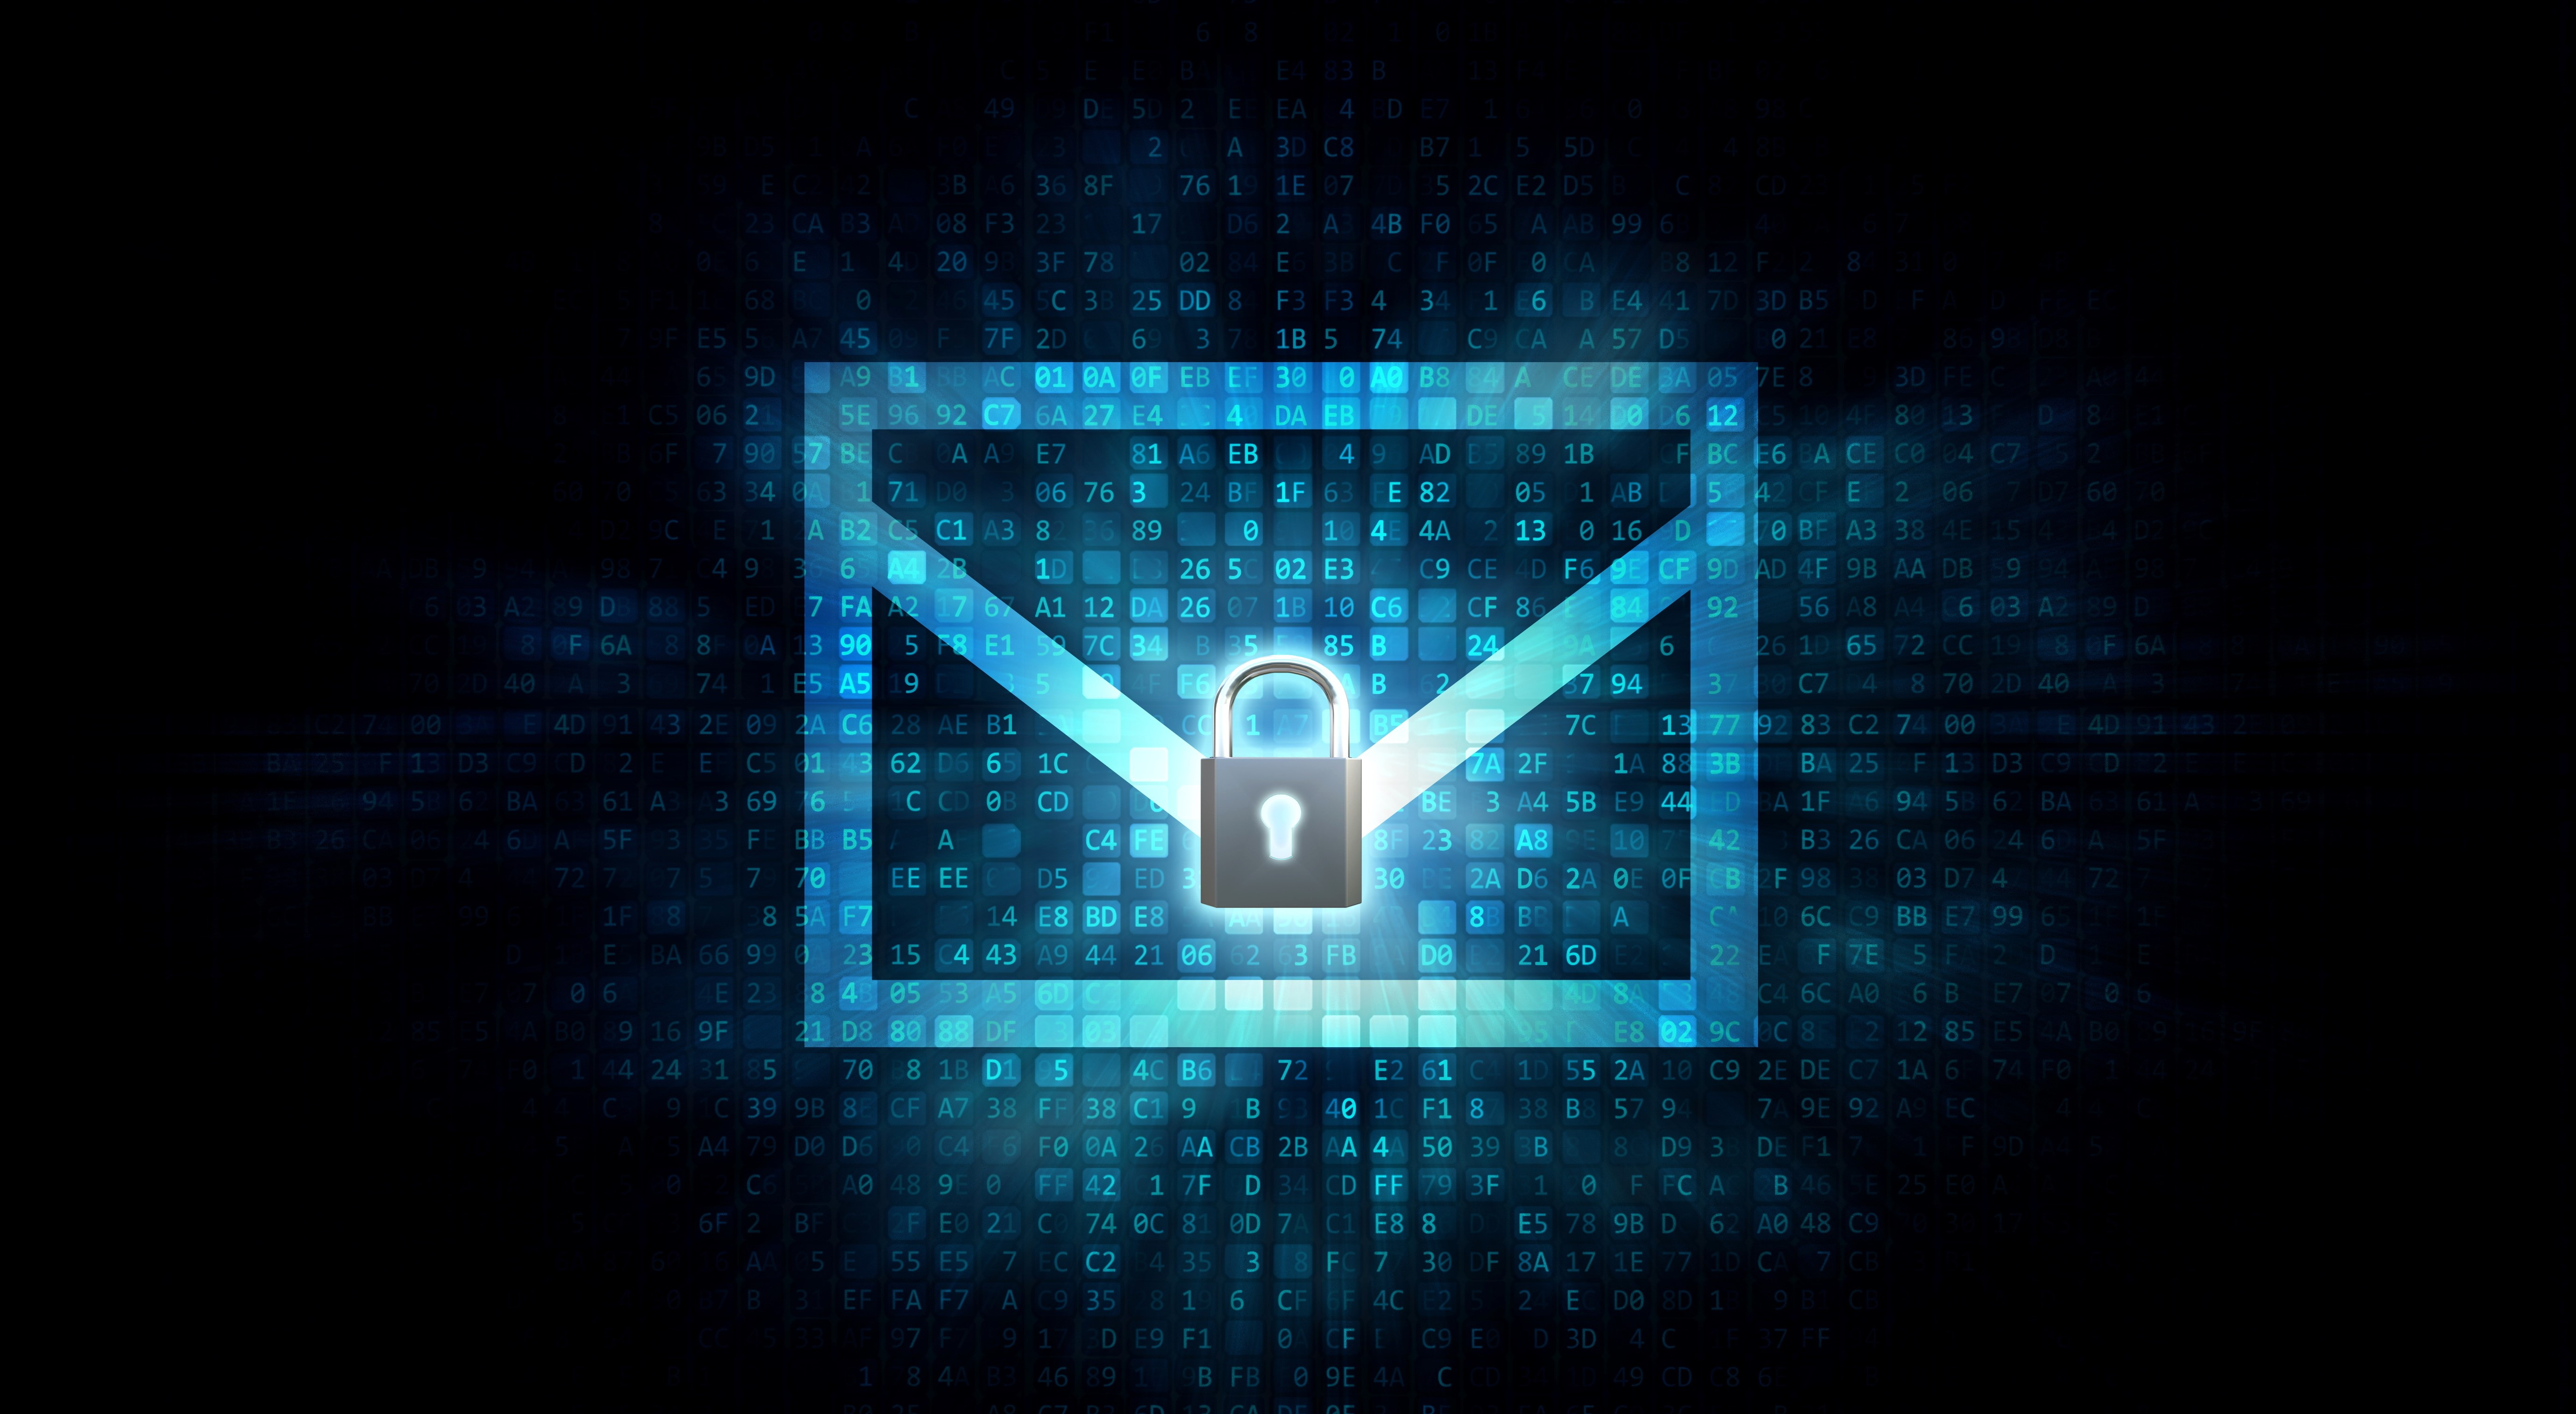 Security Alert: Critical Vulnerability in Microsoft Exchange